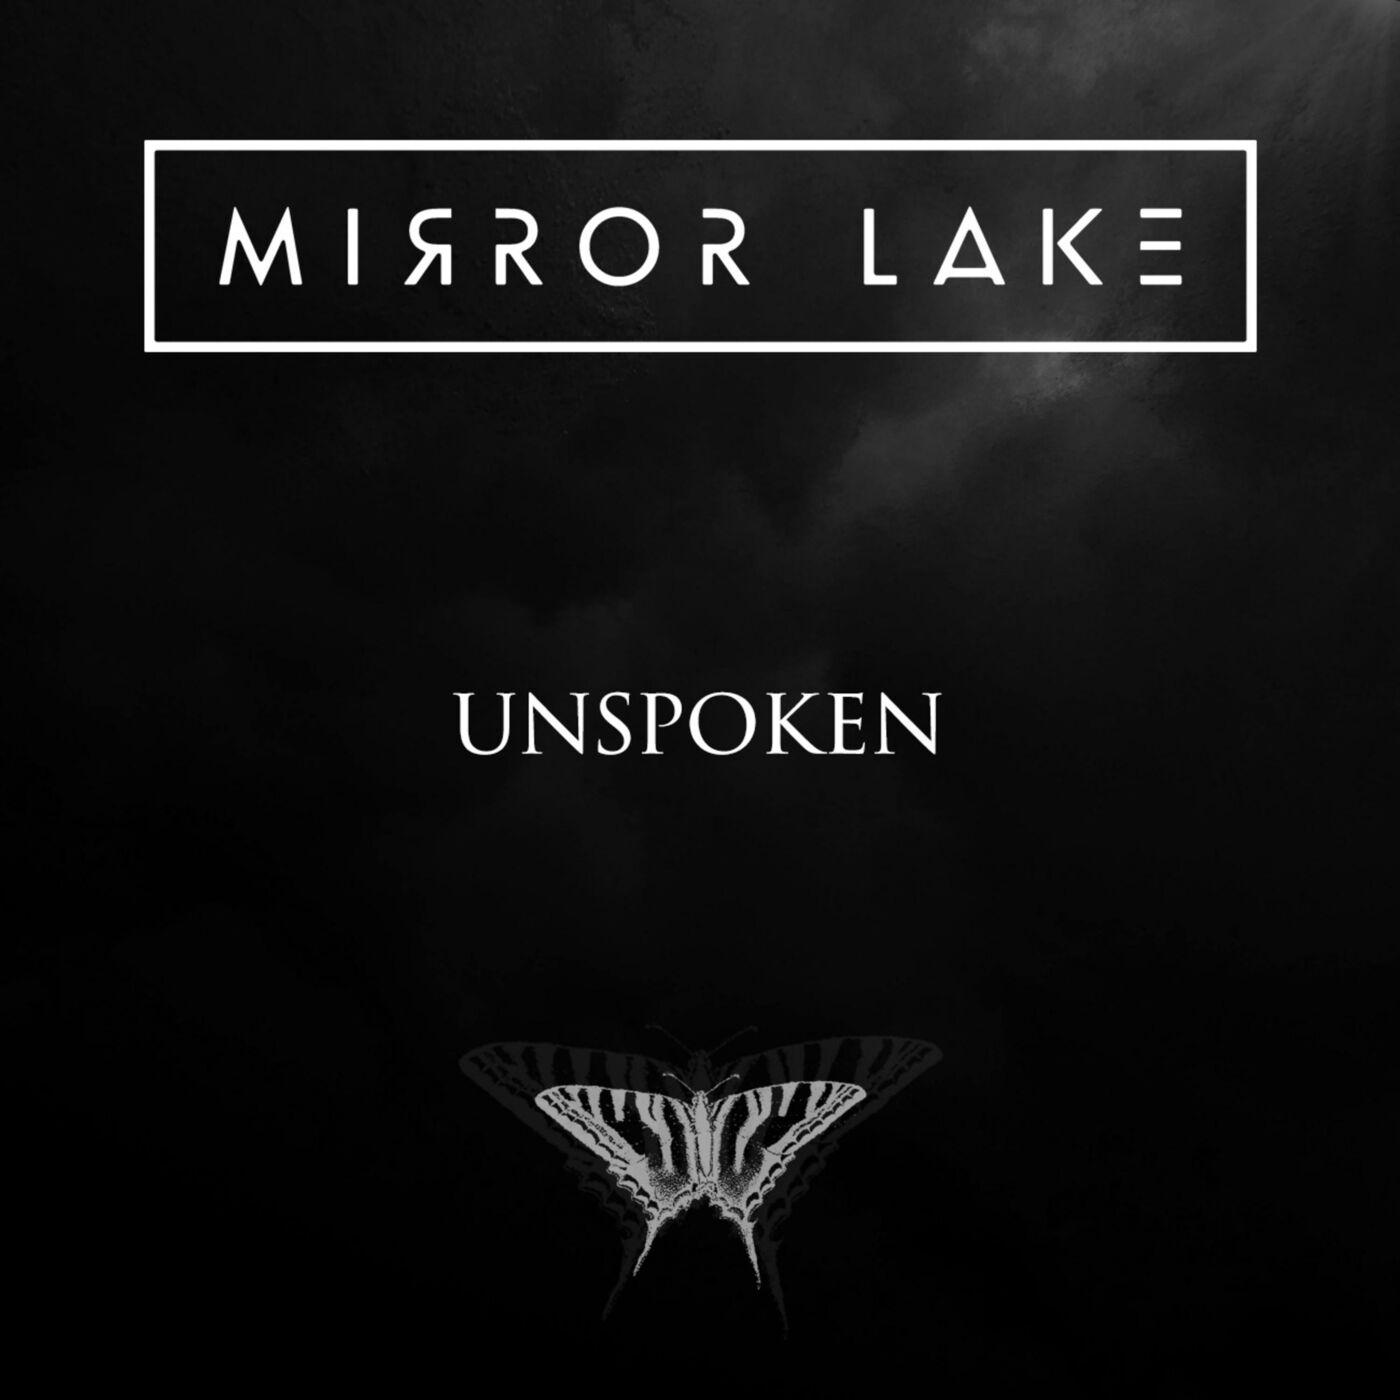 Mirror Lake - Unspoken [single] (2019)